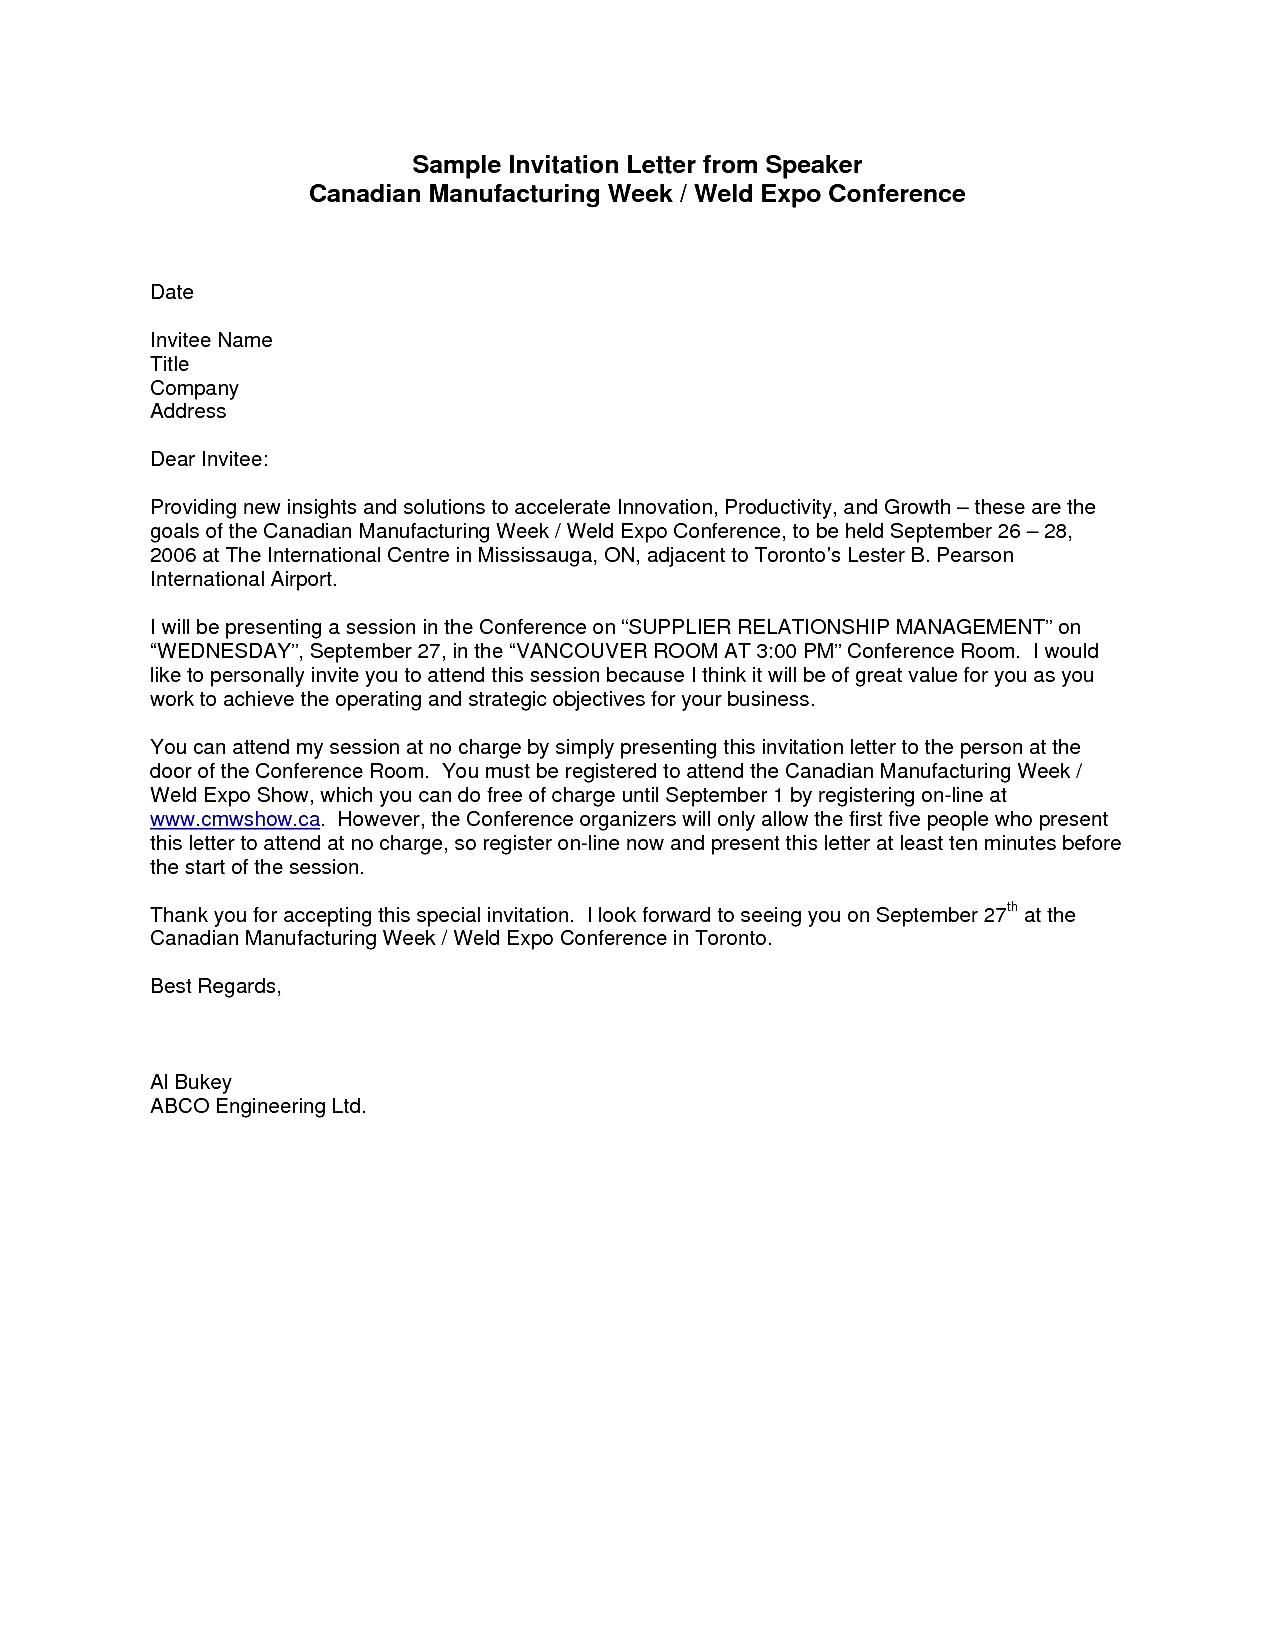 Formal invitation letter solarfm 7 sample business invitation letters sample templates stopboris Choice Image